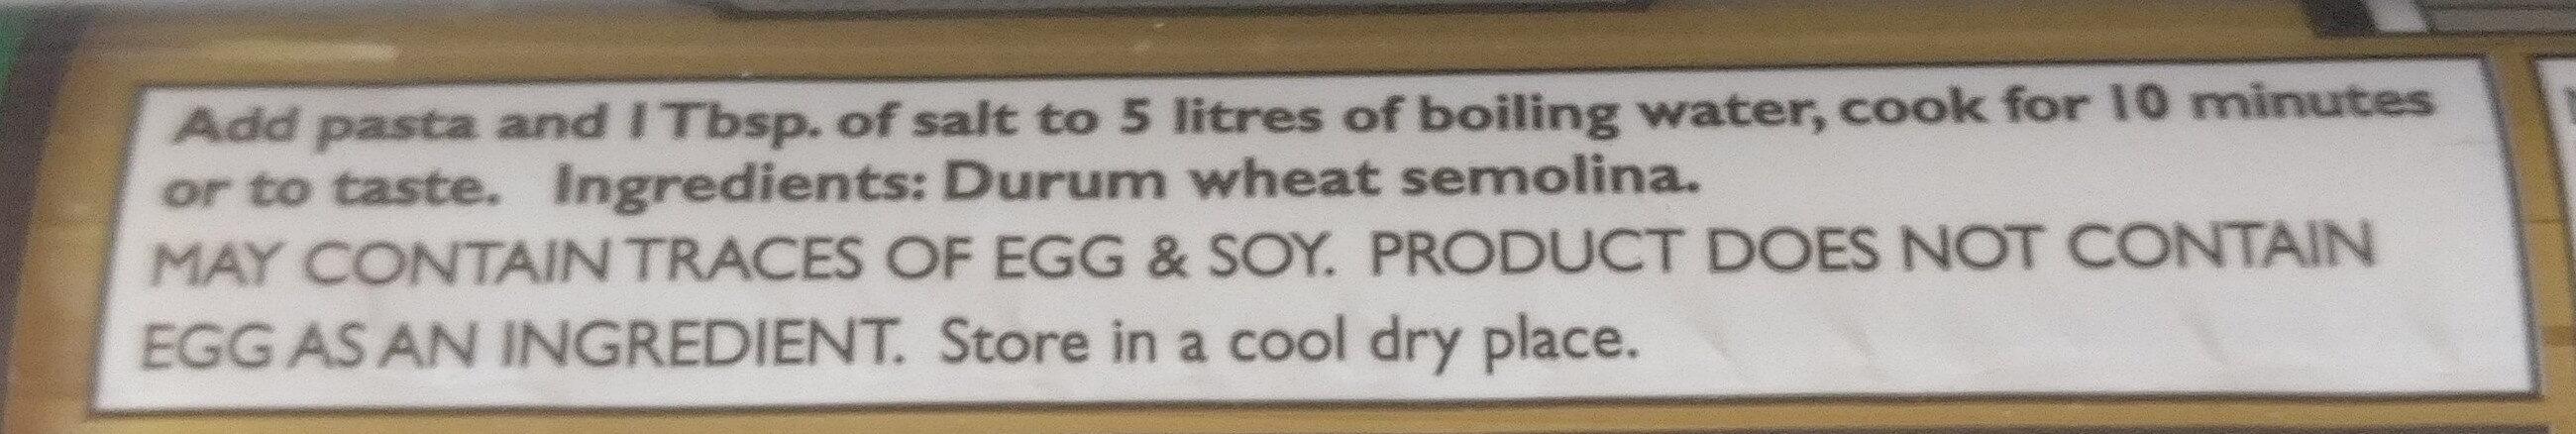 Linguine No. 1 - Ingredients - en